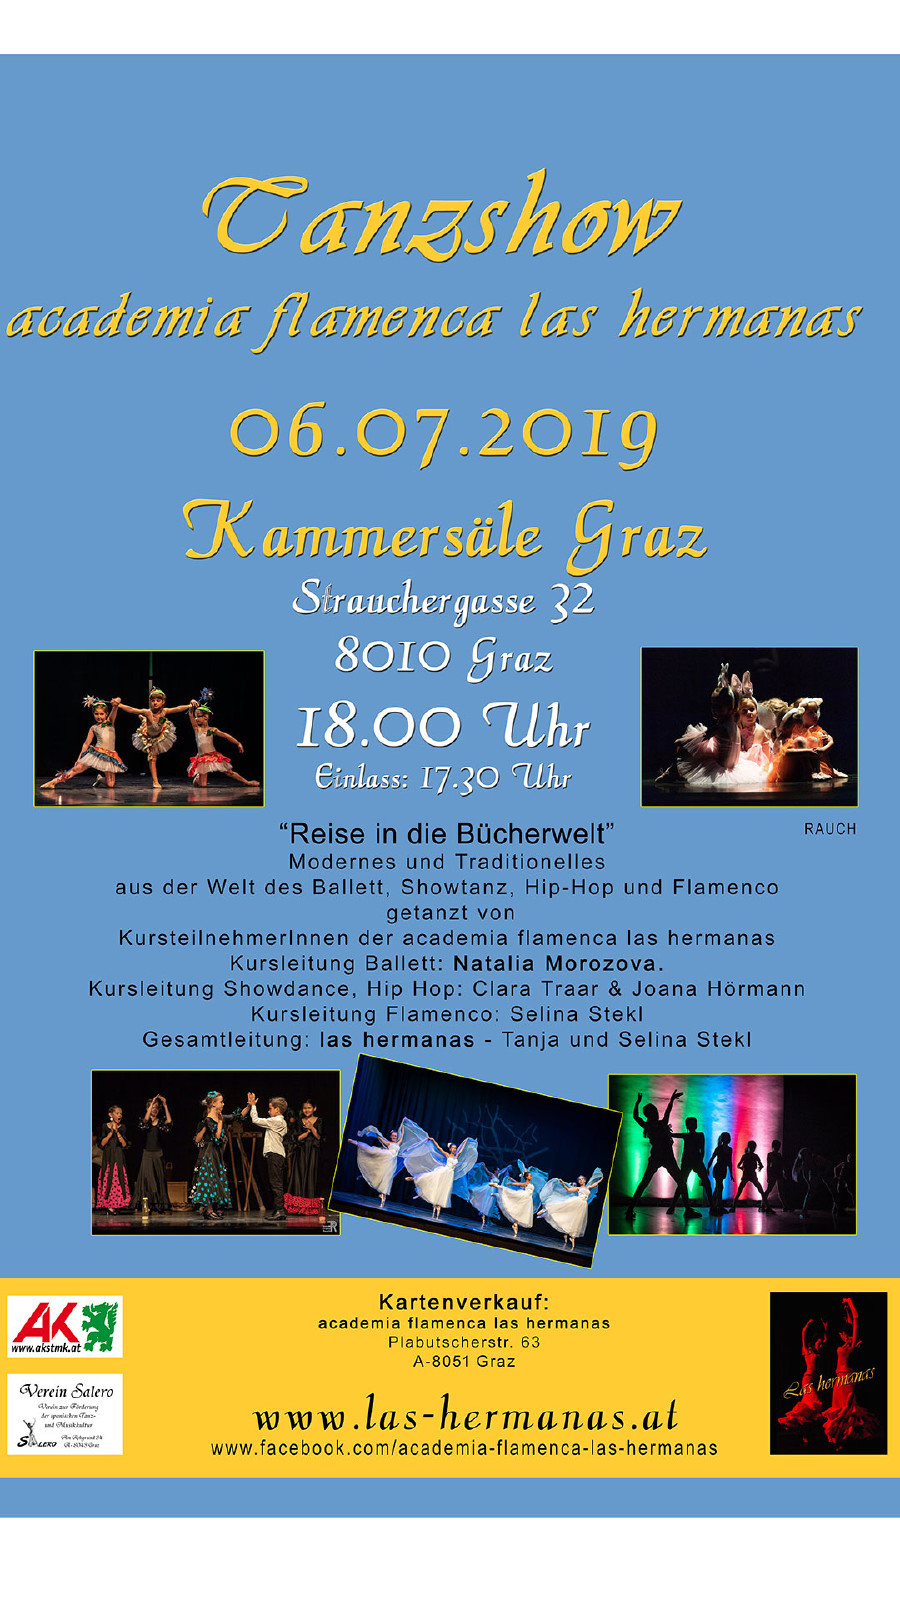 Abschluss-Show am 6. Juli ab 18 Uhr in den Kammersälen in Graz. © academia flamenca las hermanas, AK Stmk